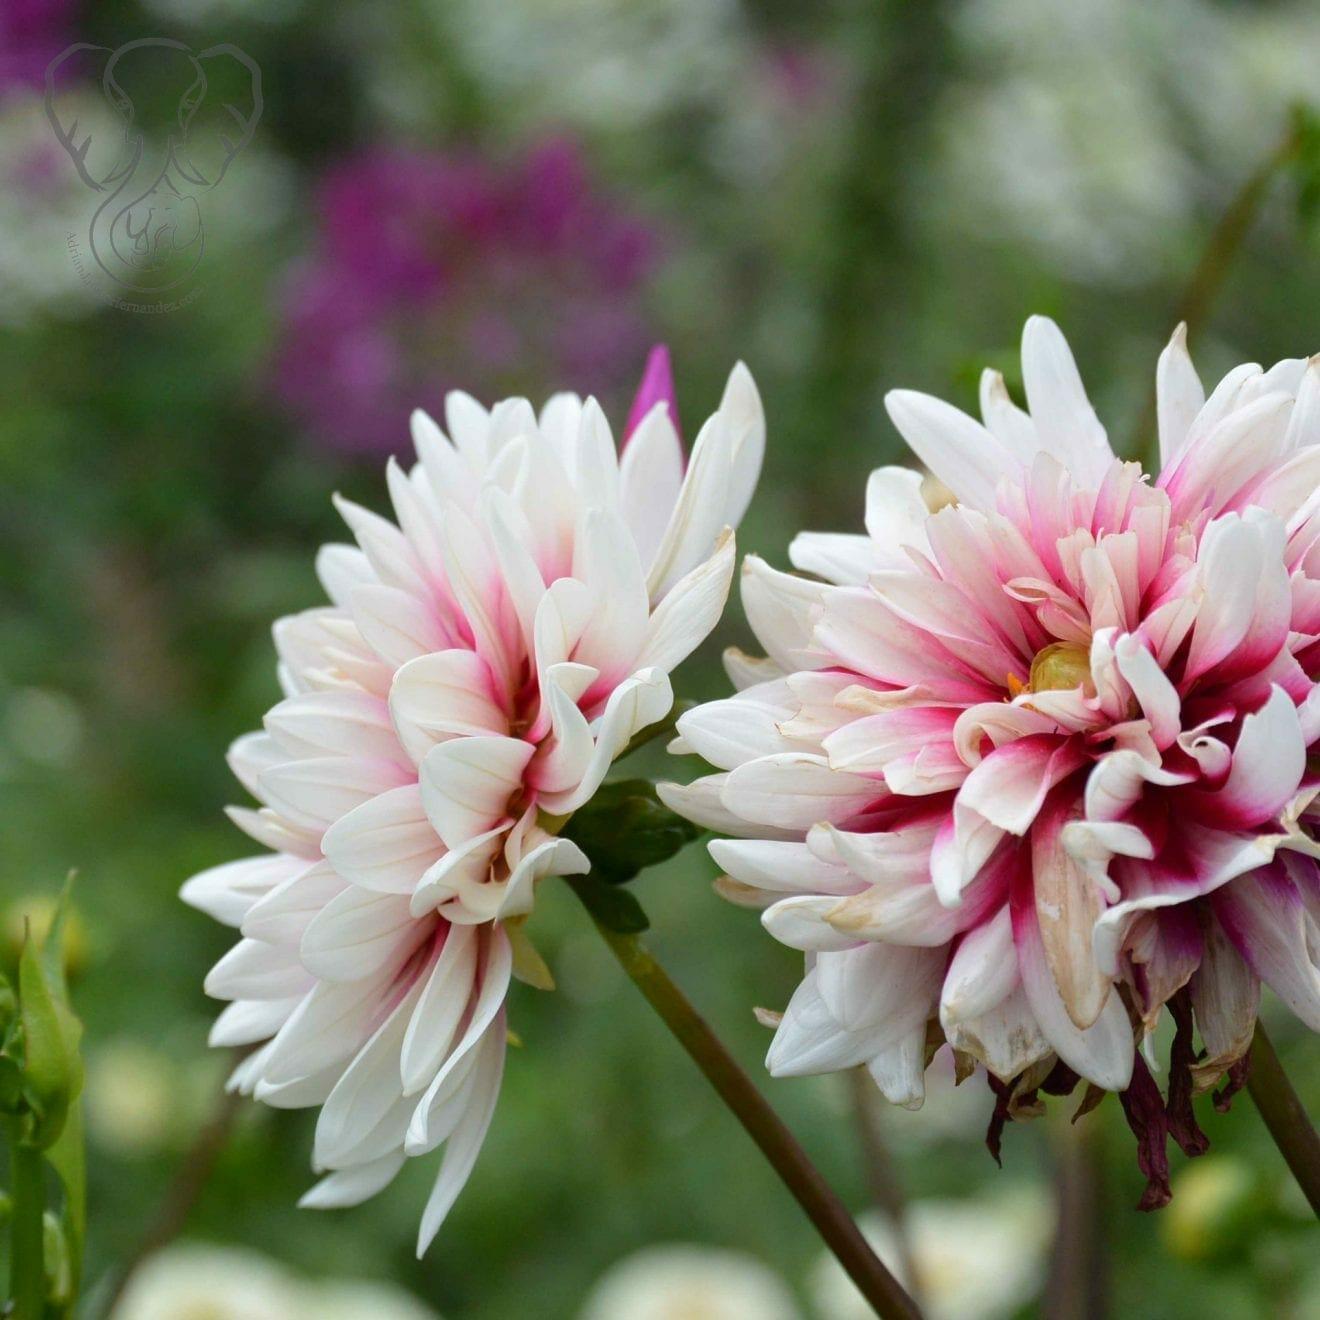 Annual flowers in Assiniboine Park, Winnipeg, Manitoba (Miranda Hernandez)